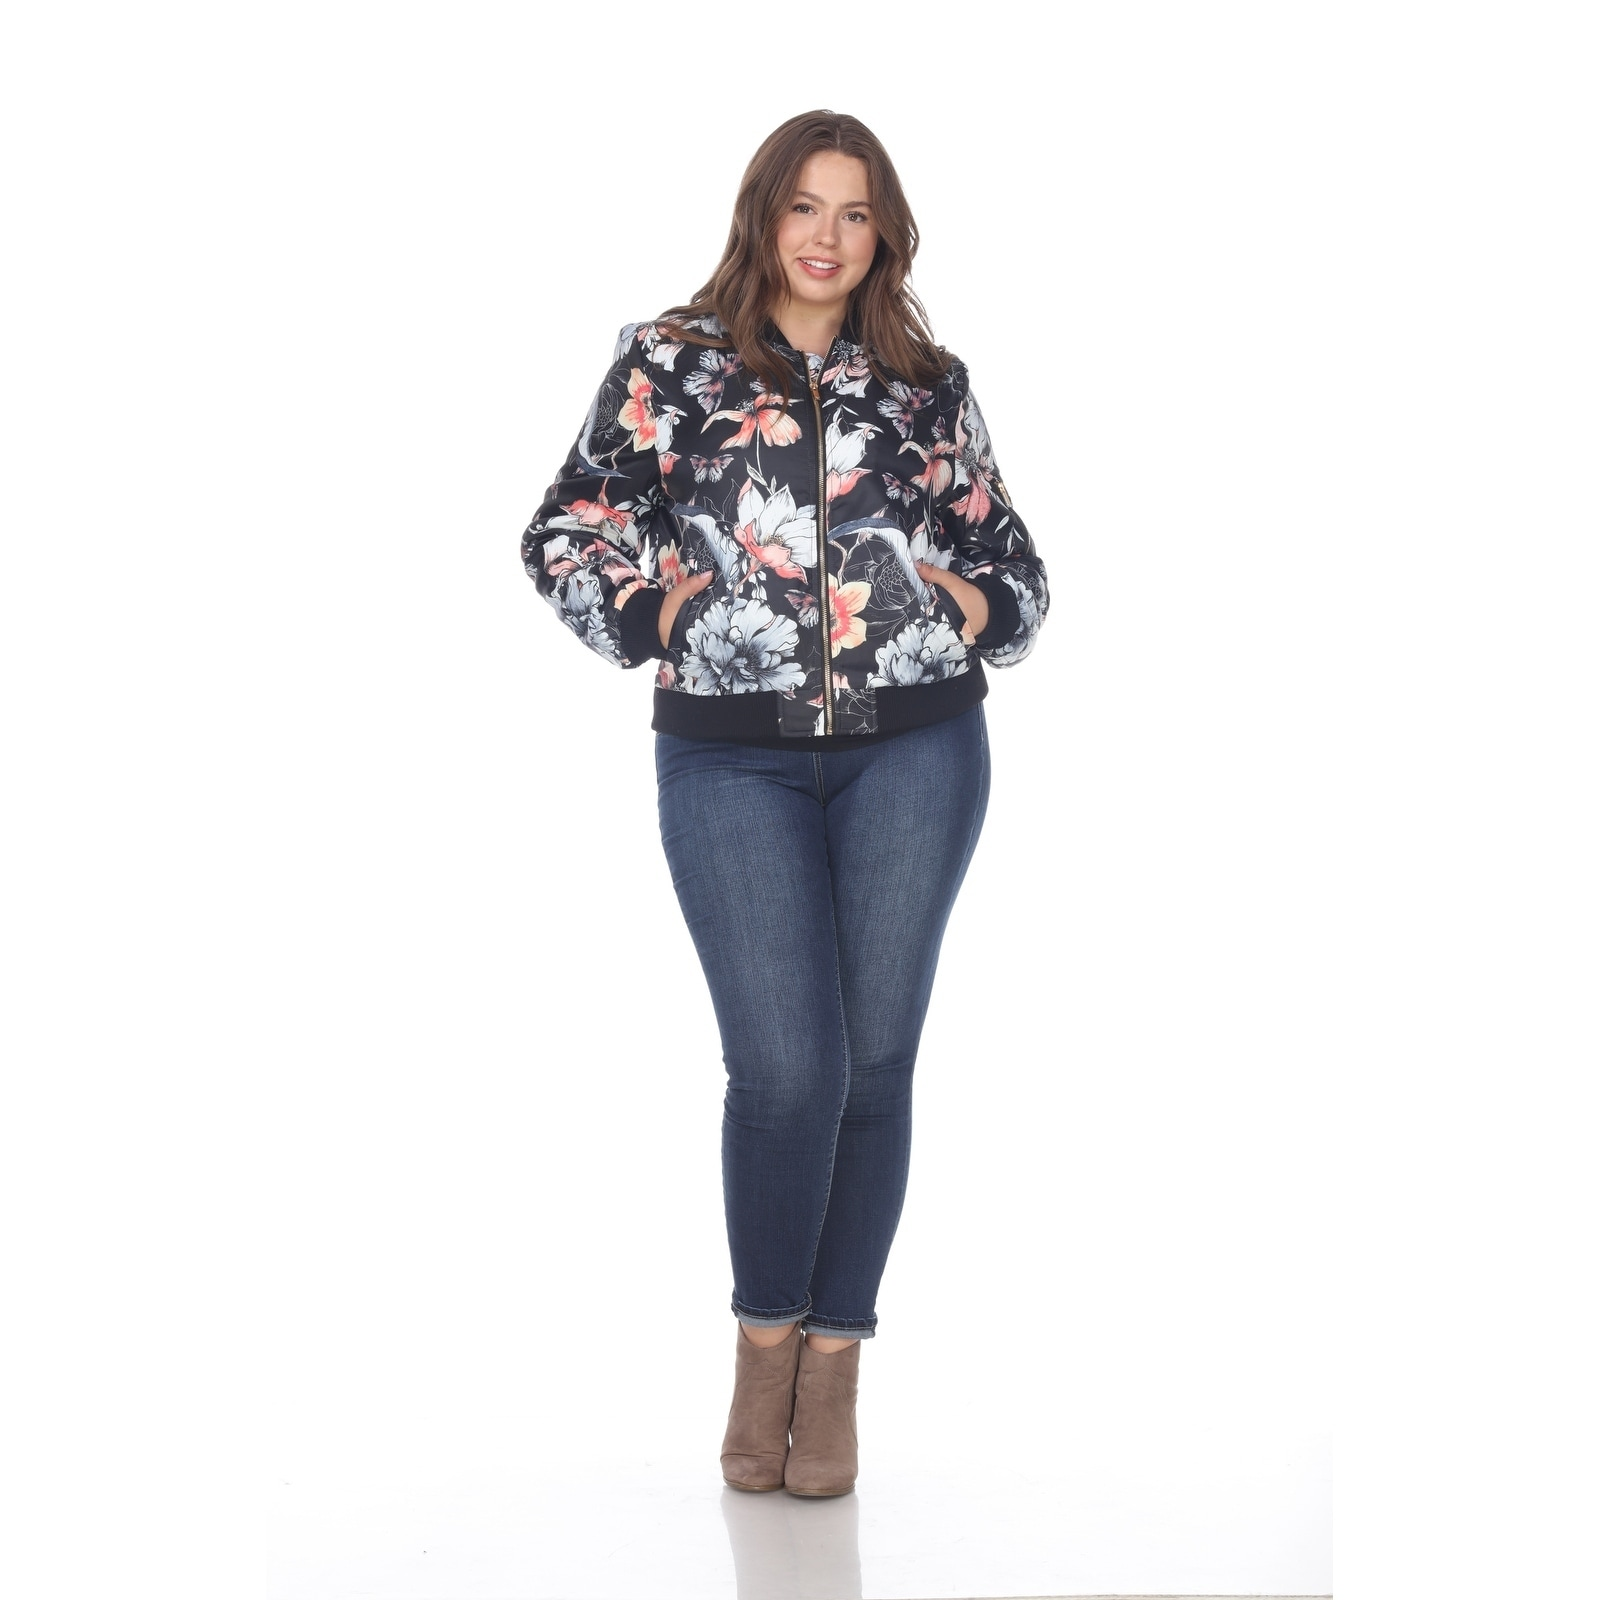 ab908375b1d White Mark Women s Plus Size Floral Bomber Jacket